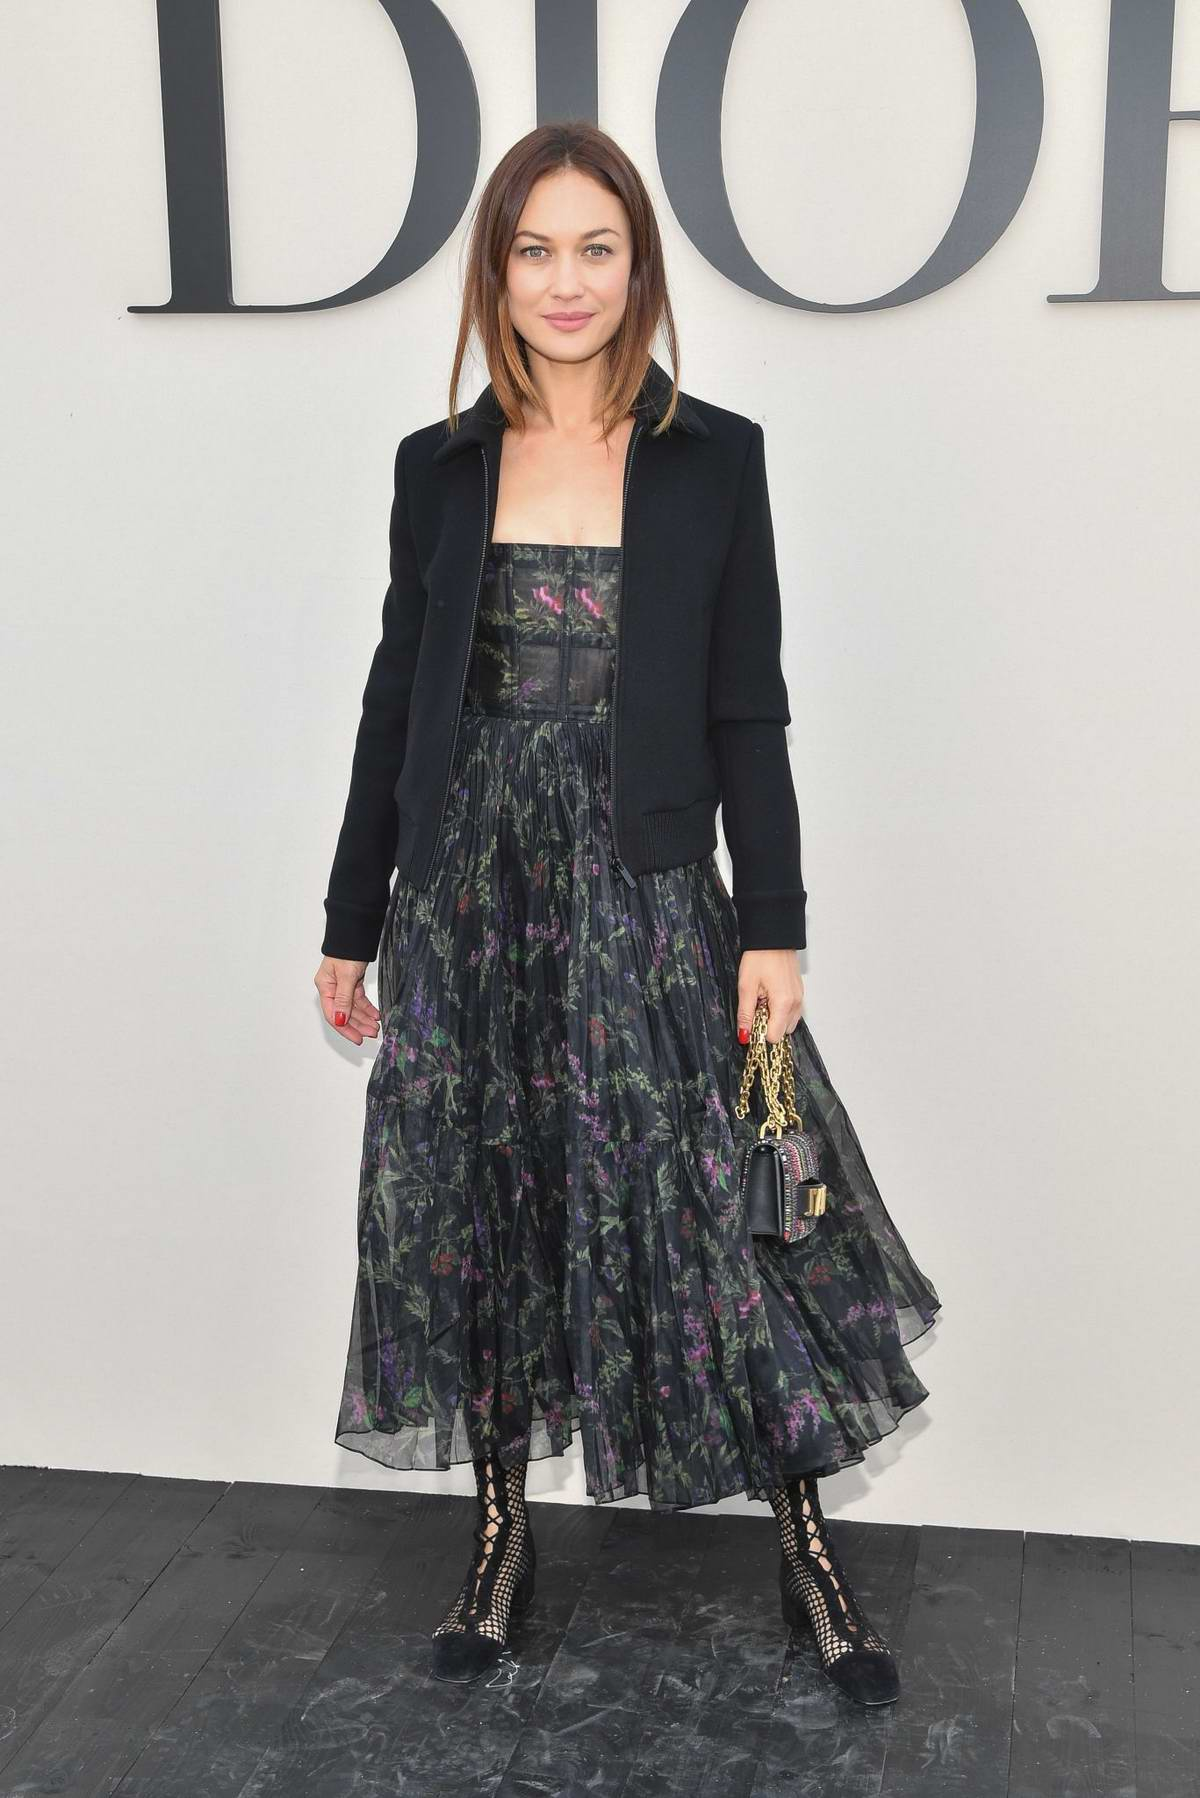 Olga Kurylenko attends the Christian Dior Show during Paris Fashion Week in Paris, France